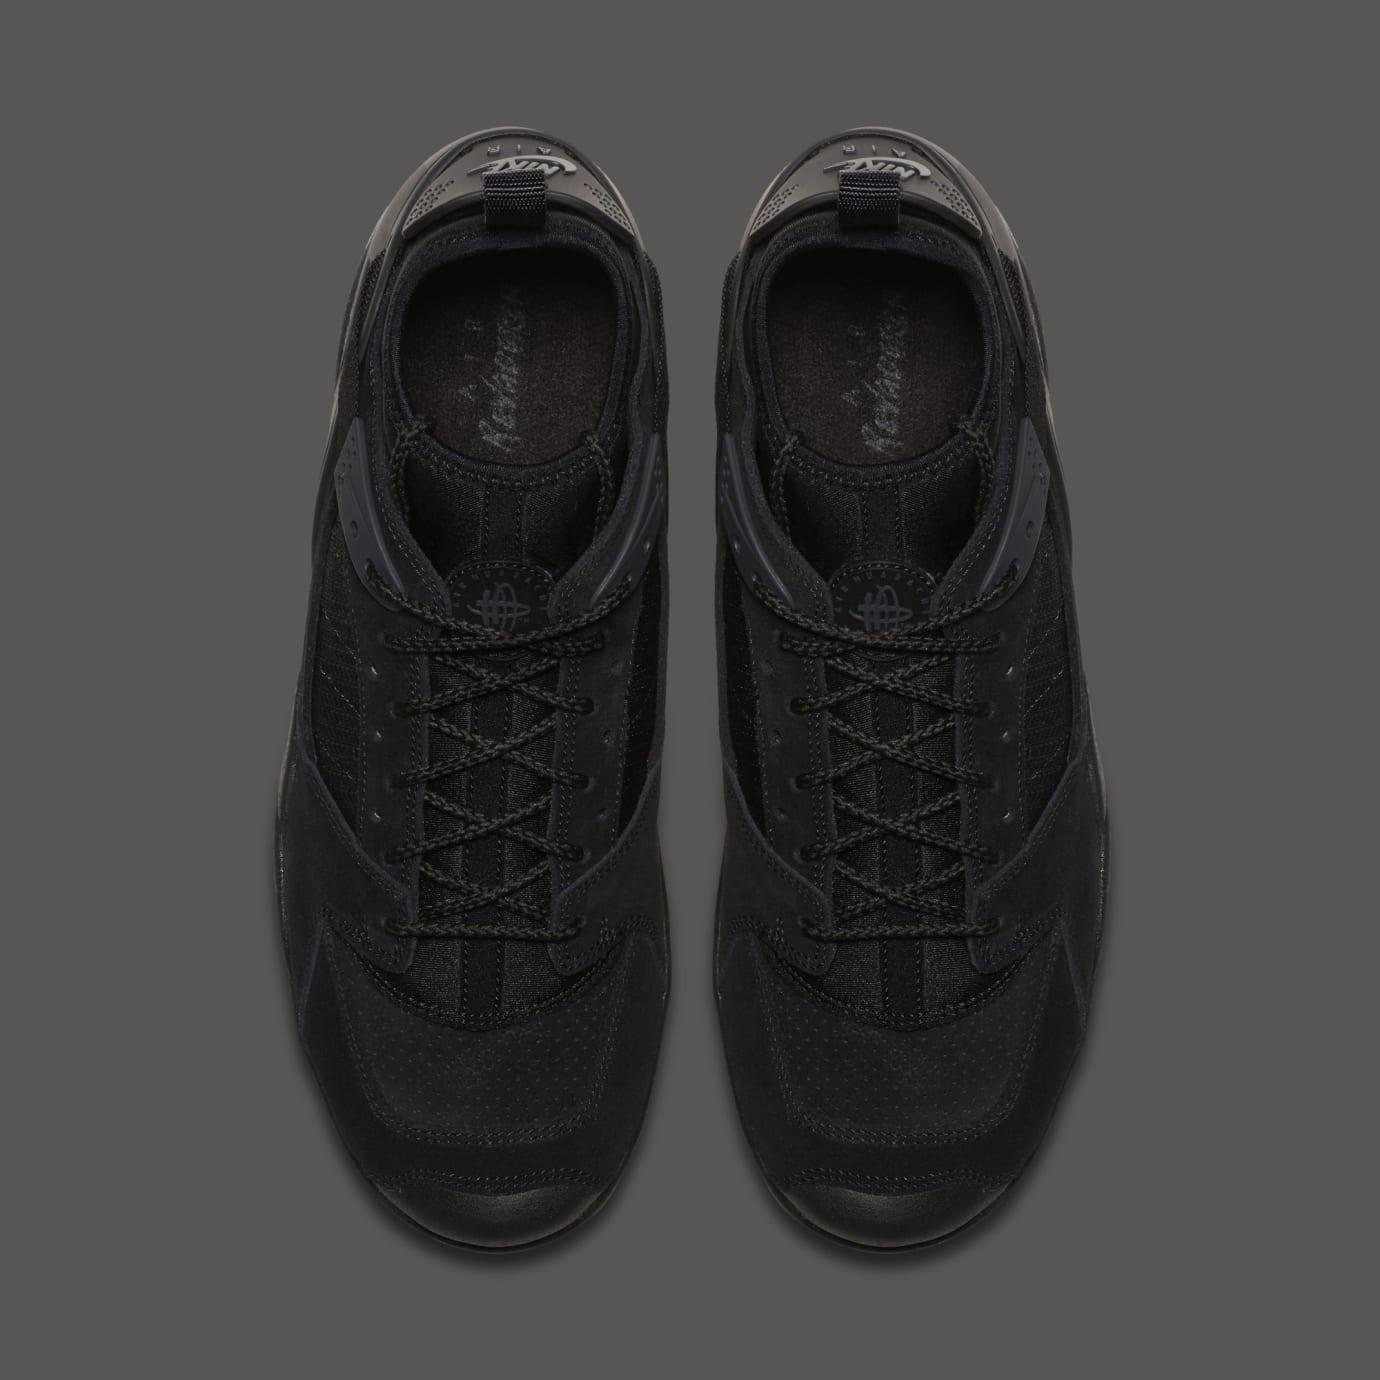 691c2bcb6 Image via Nike Nike Air Revaderchi 'Black/Anthracite-Black' AR0479-002 (Top)